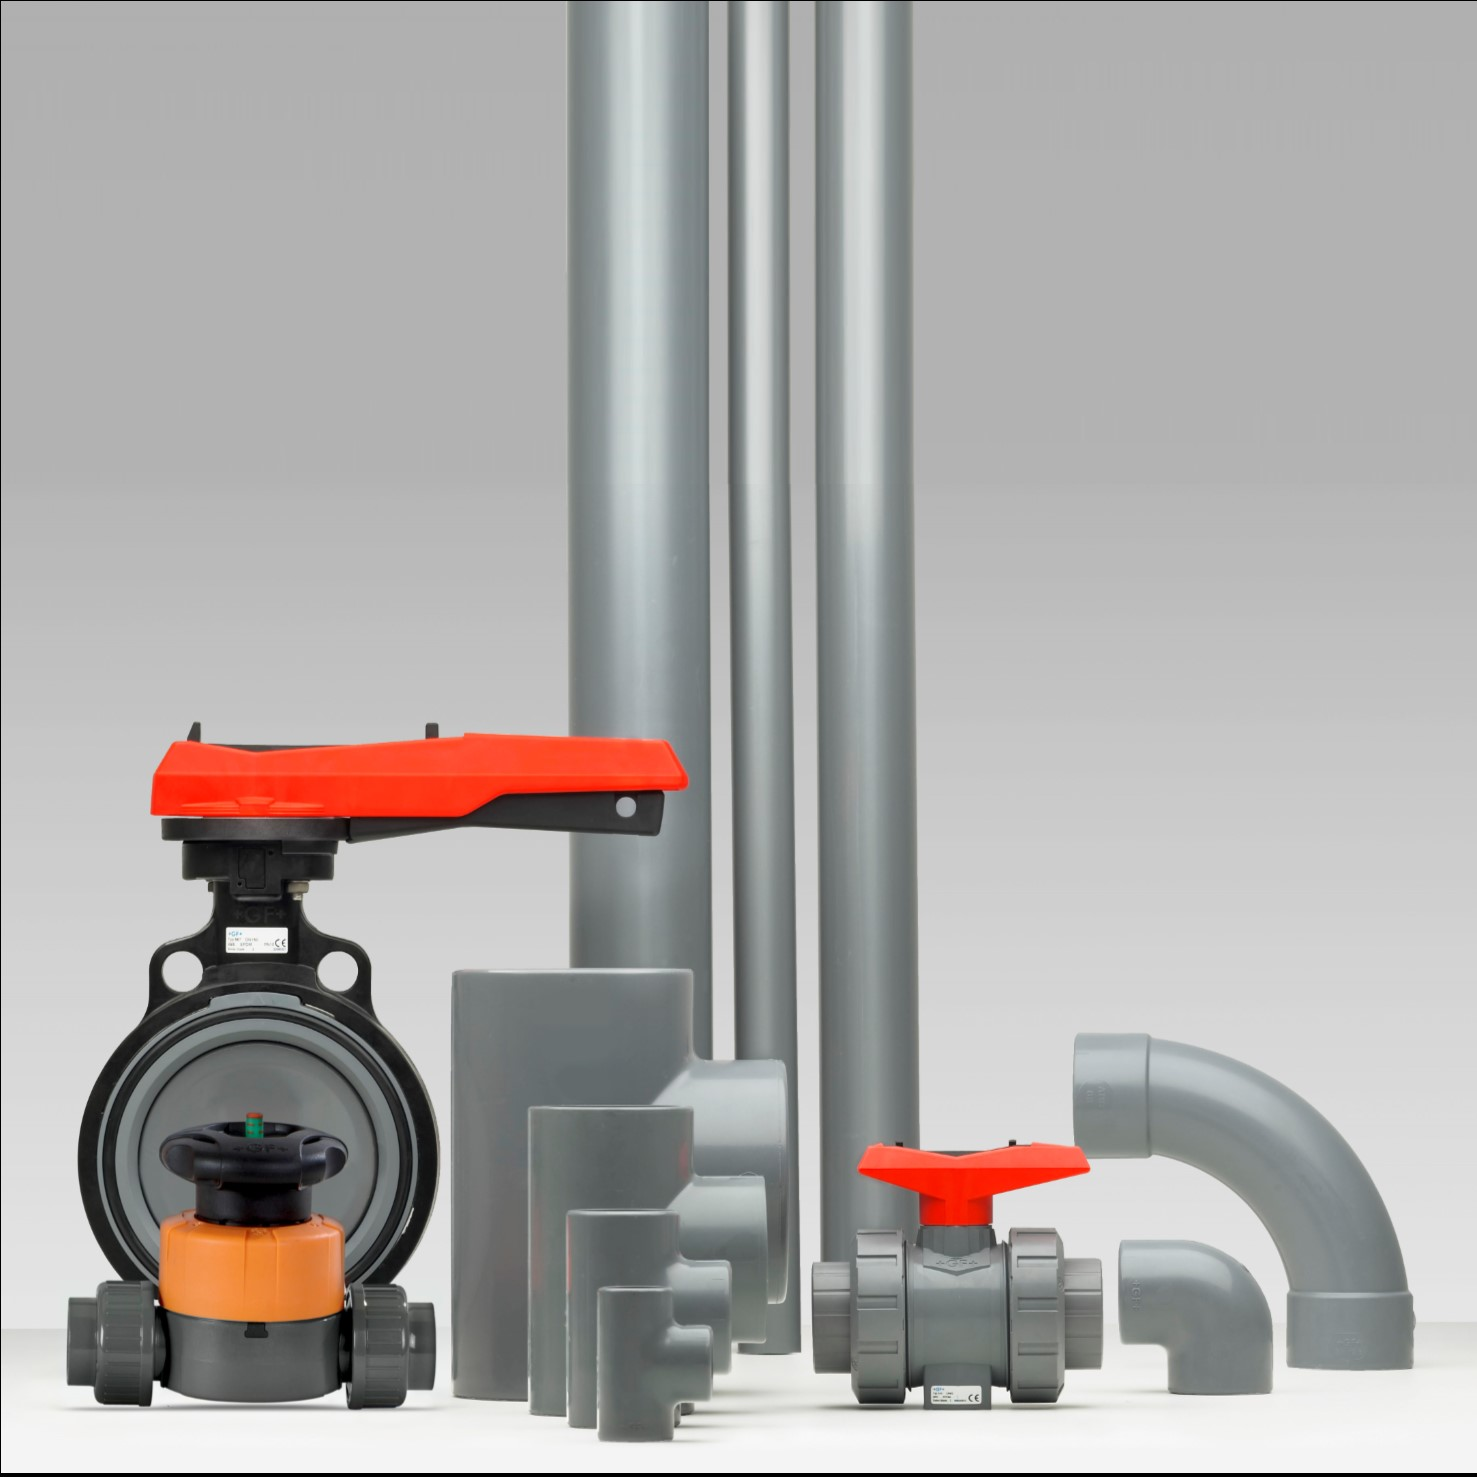 ABS industriële kunststof leidingsystemen